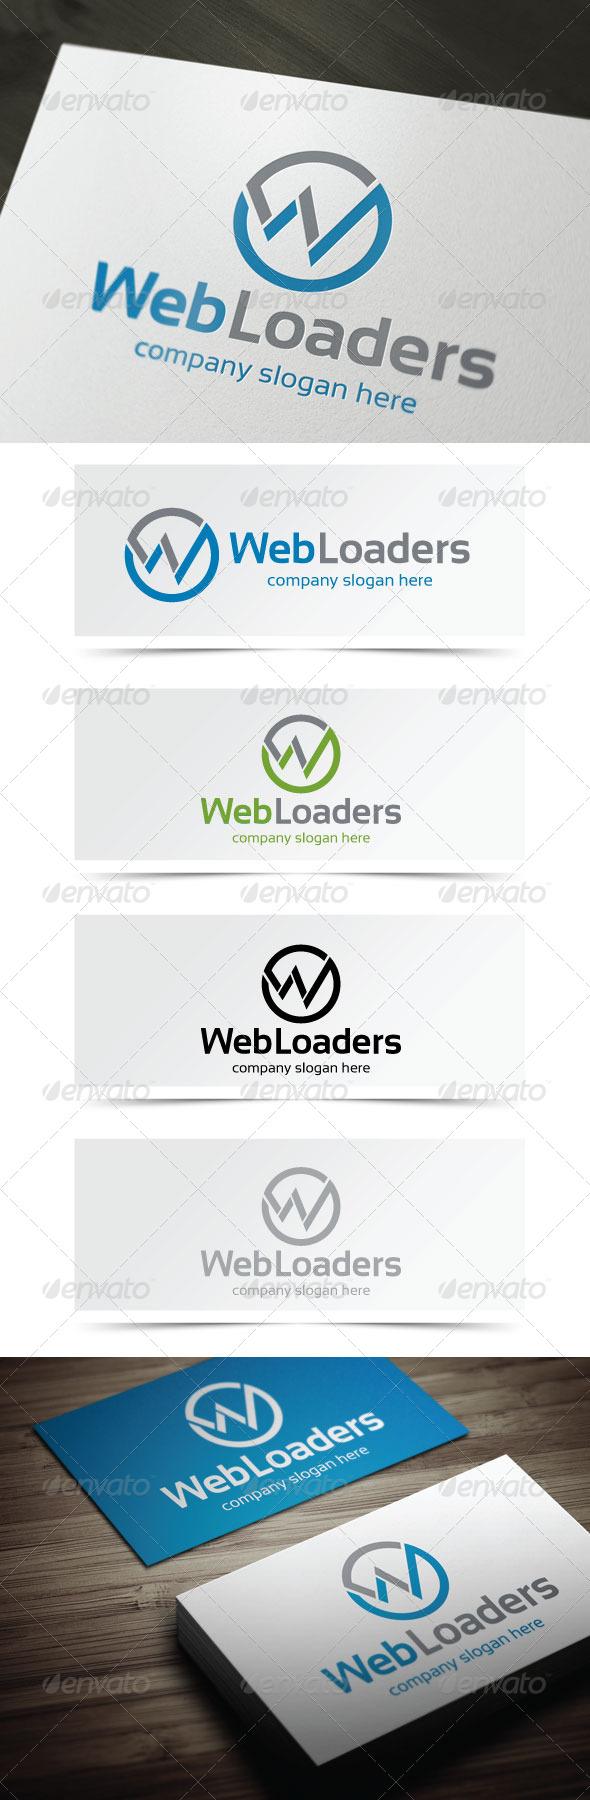 Web Loaders